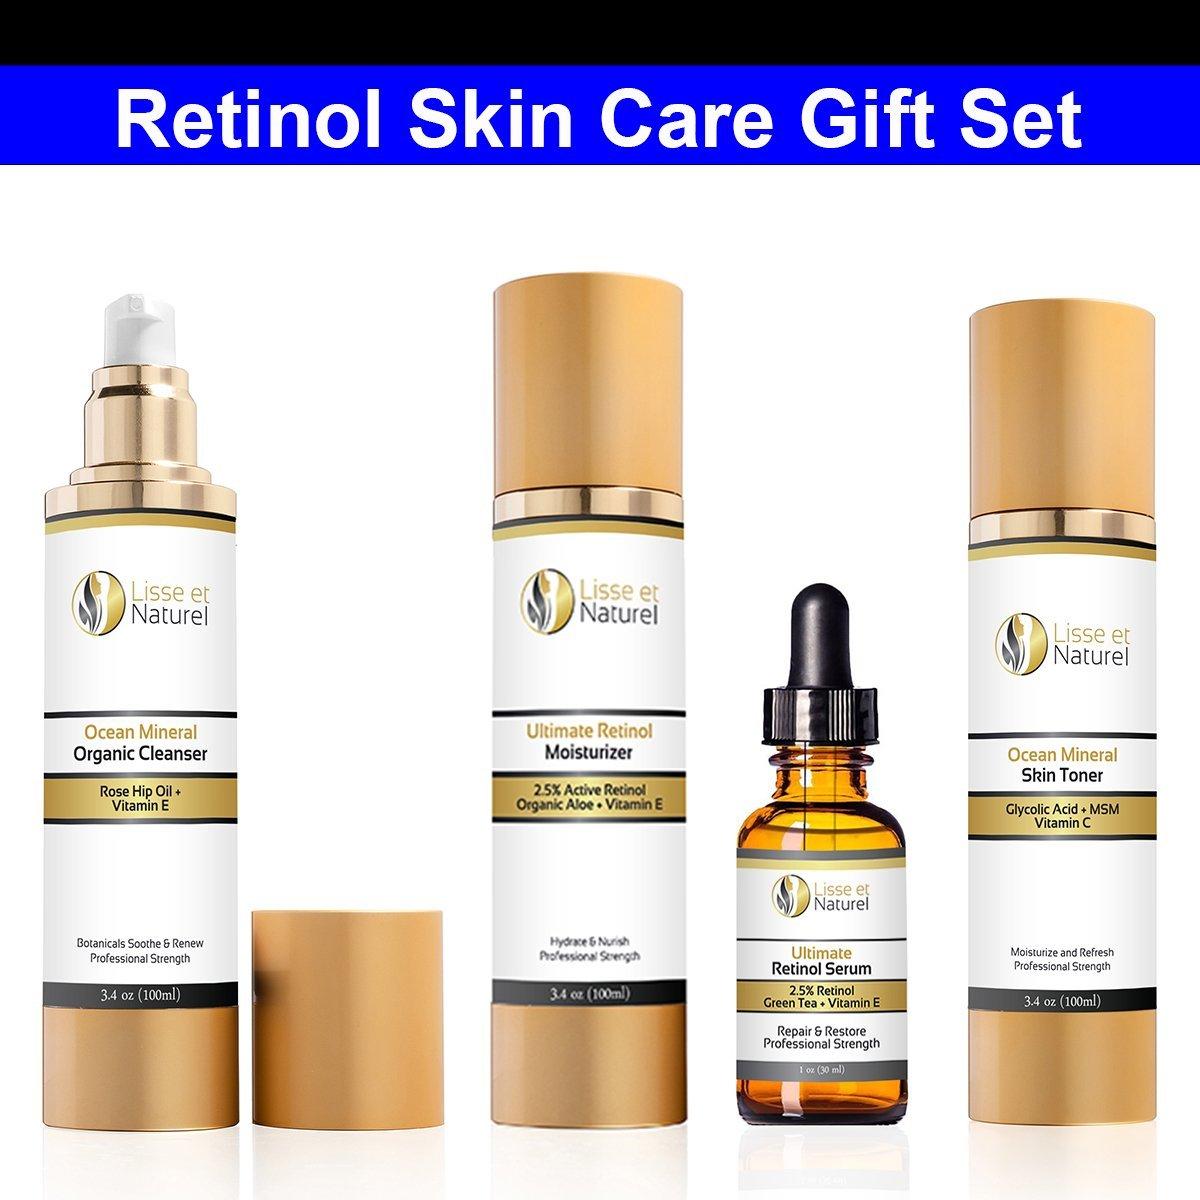 Lisse et Naturel Retinol Skin Care Gift Set